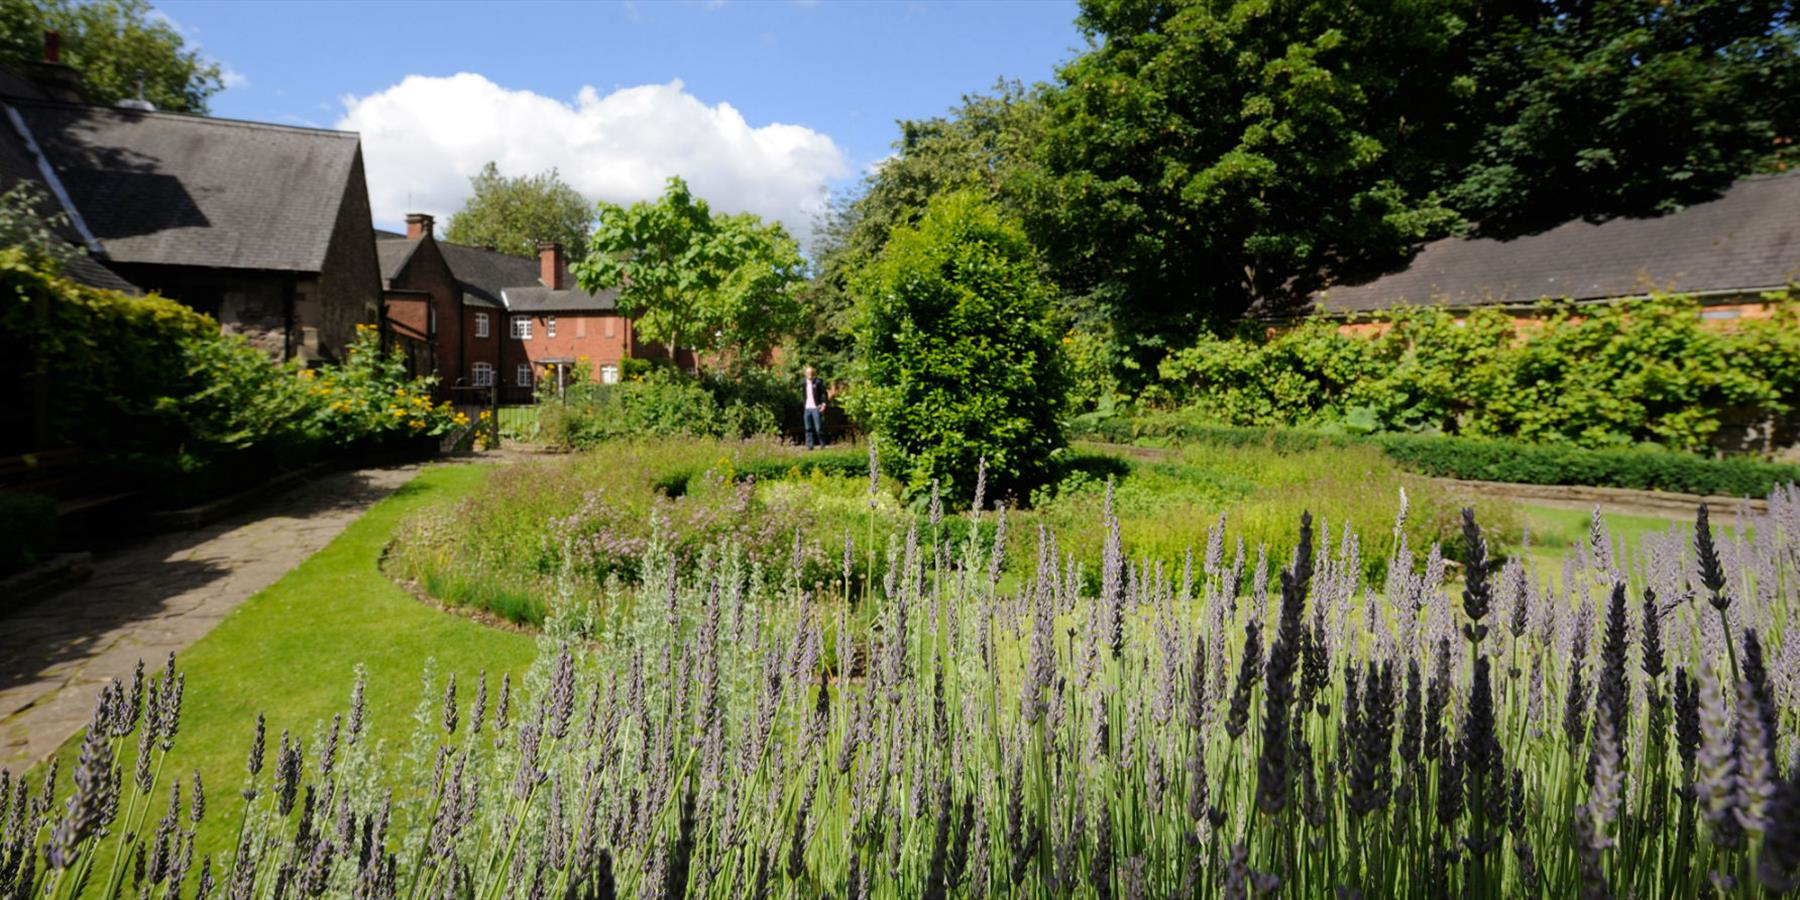 Castle Gardens - Parks, Sport & recreation in Leicester